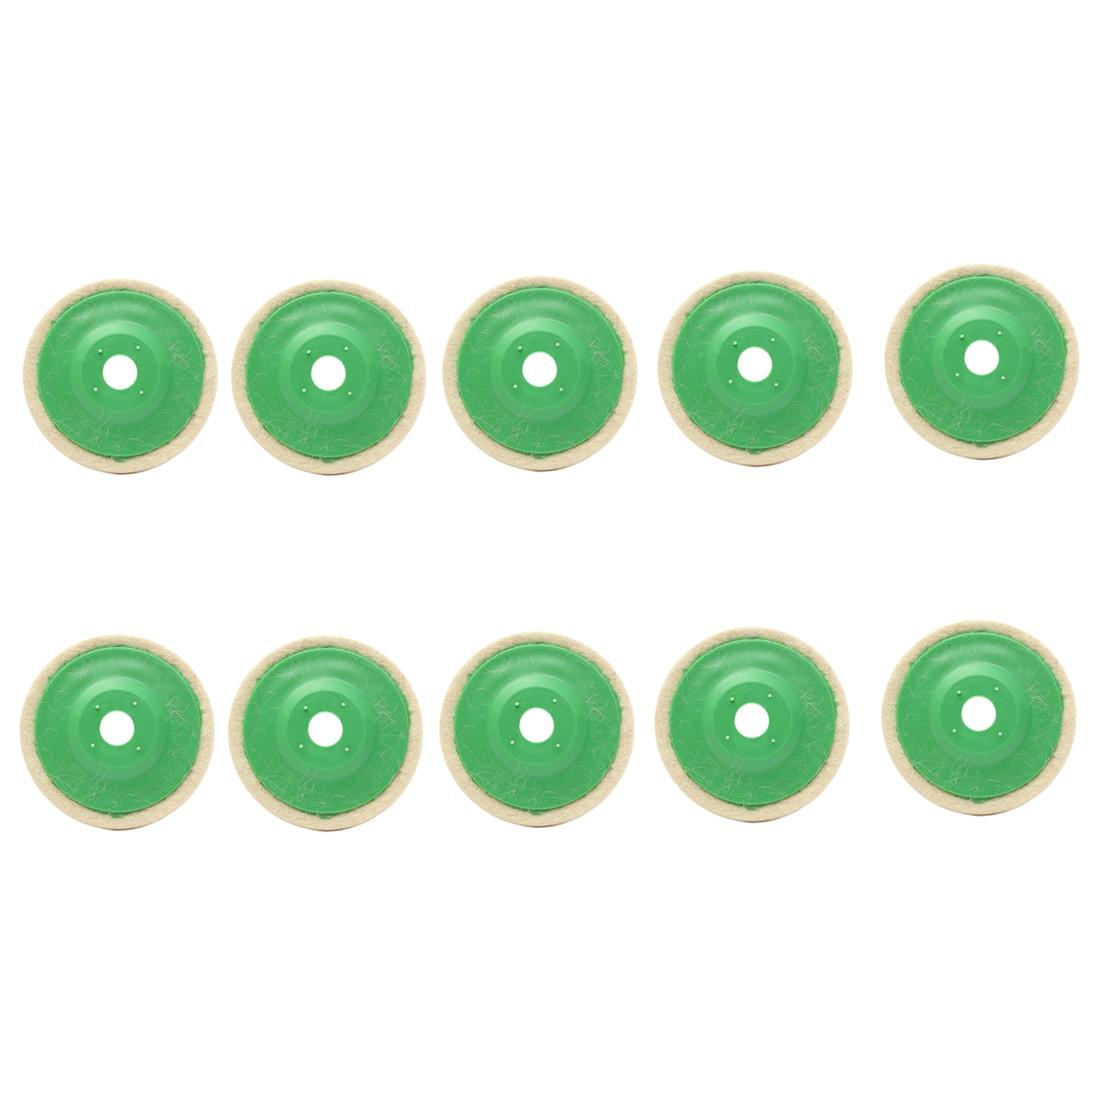 SHGO HOT-10pcs 100mm 4 Inch Round Wool Buffing Pad Polishing Wheel Felt Buffer Disc Set